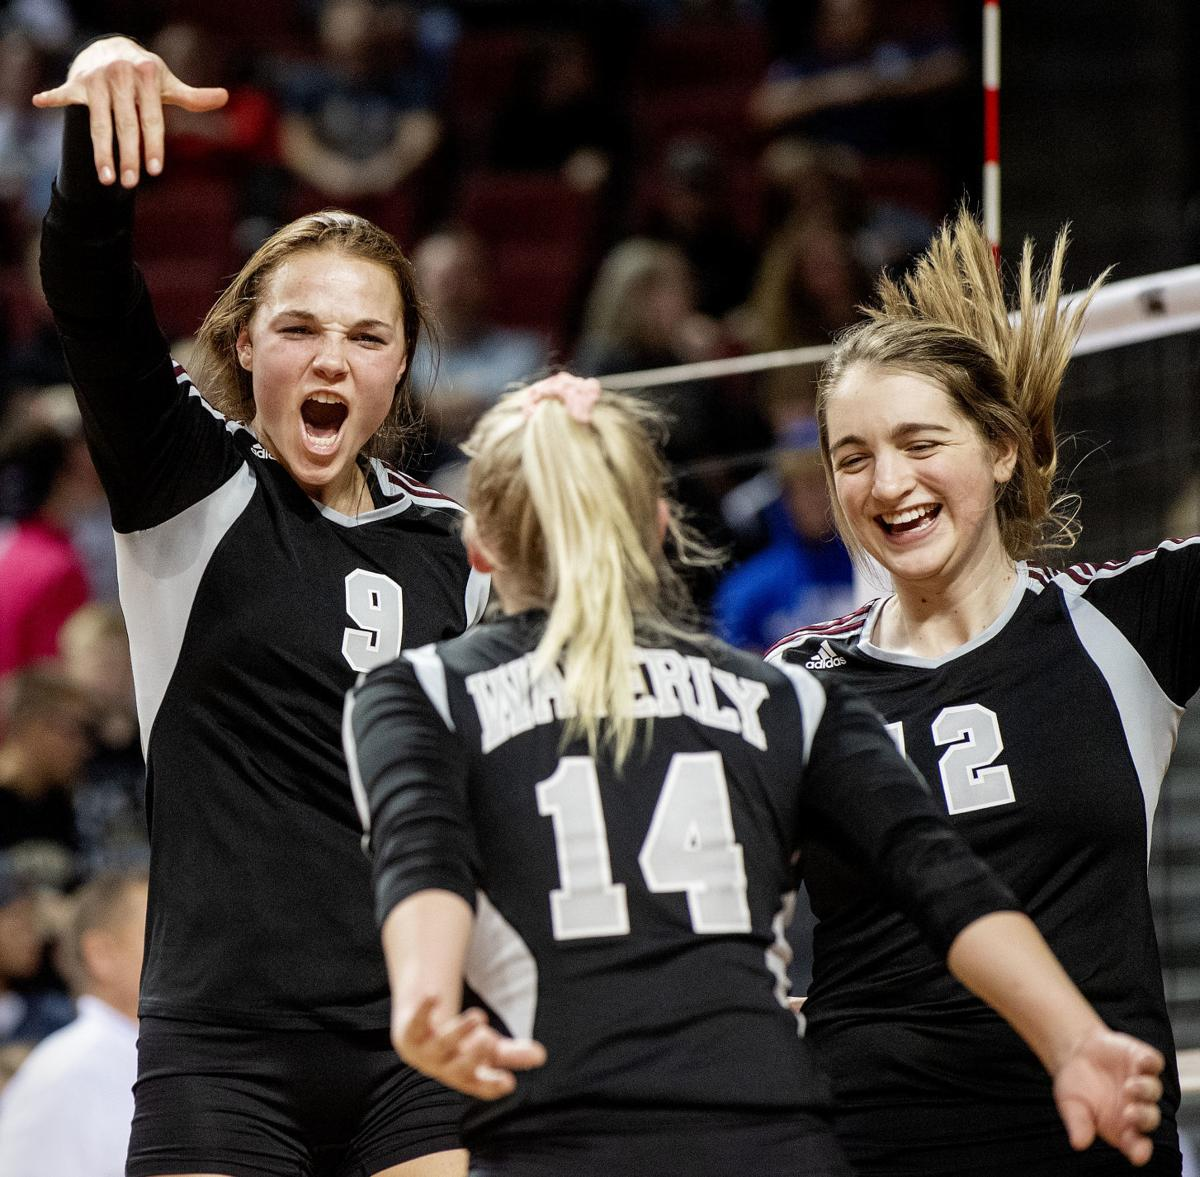 State volleyball, Waverly vs. Northwest, 11.7